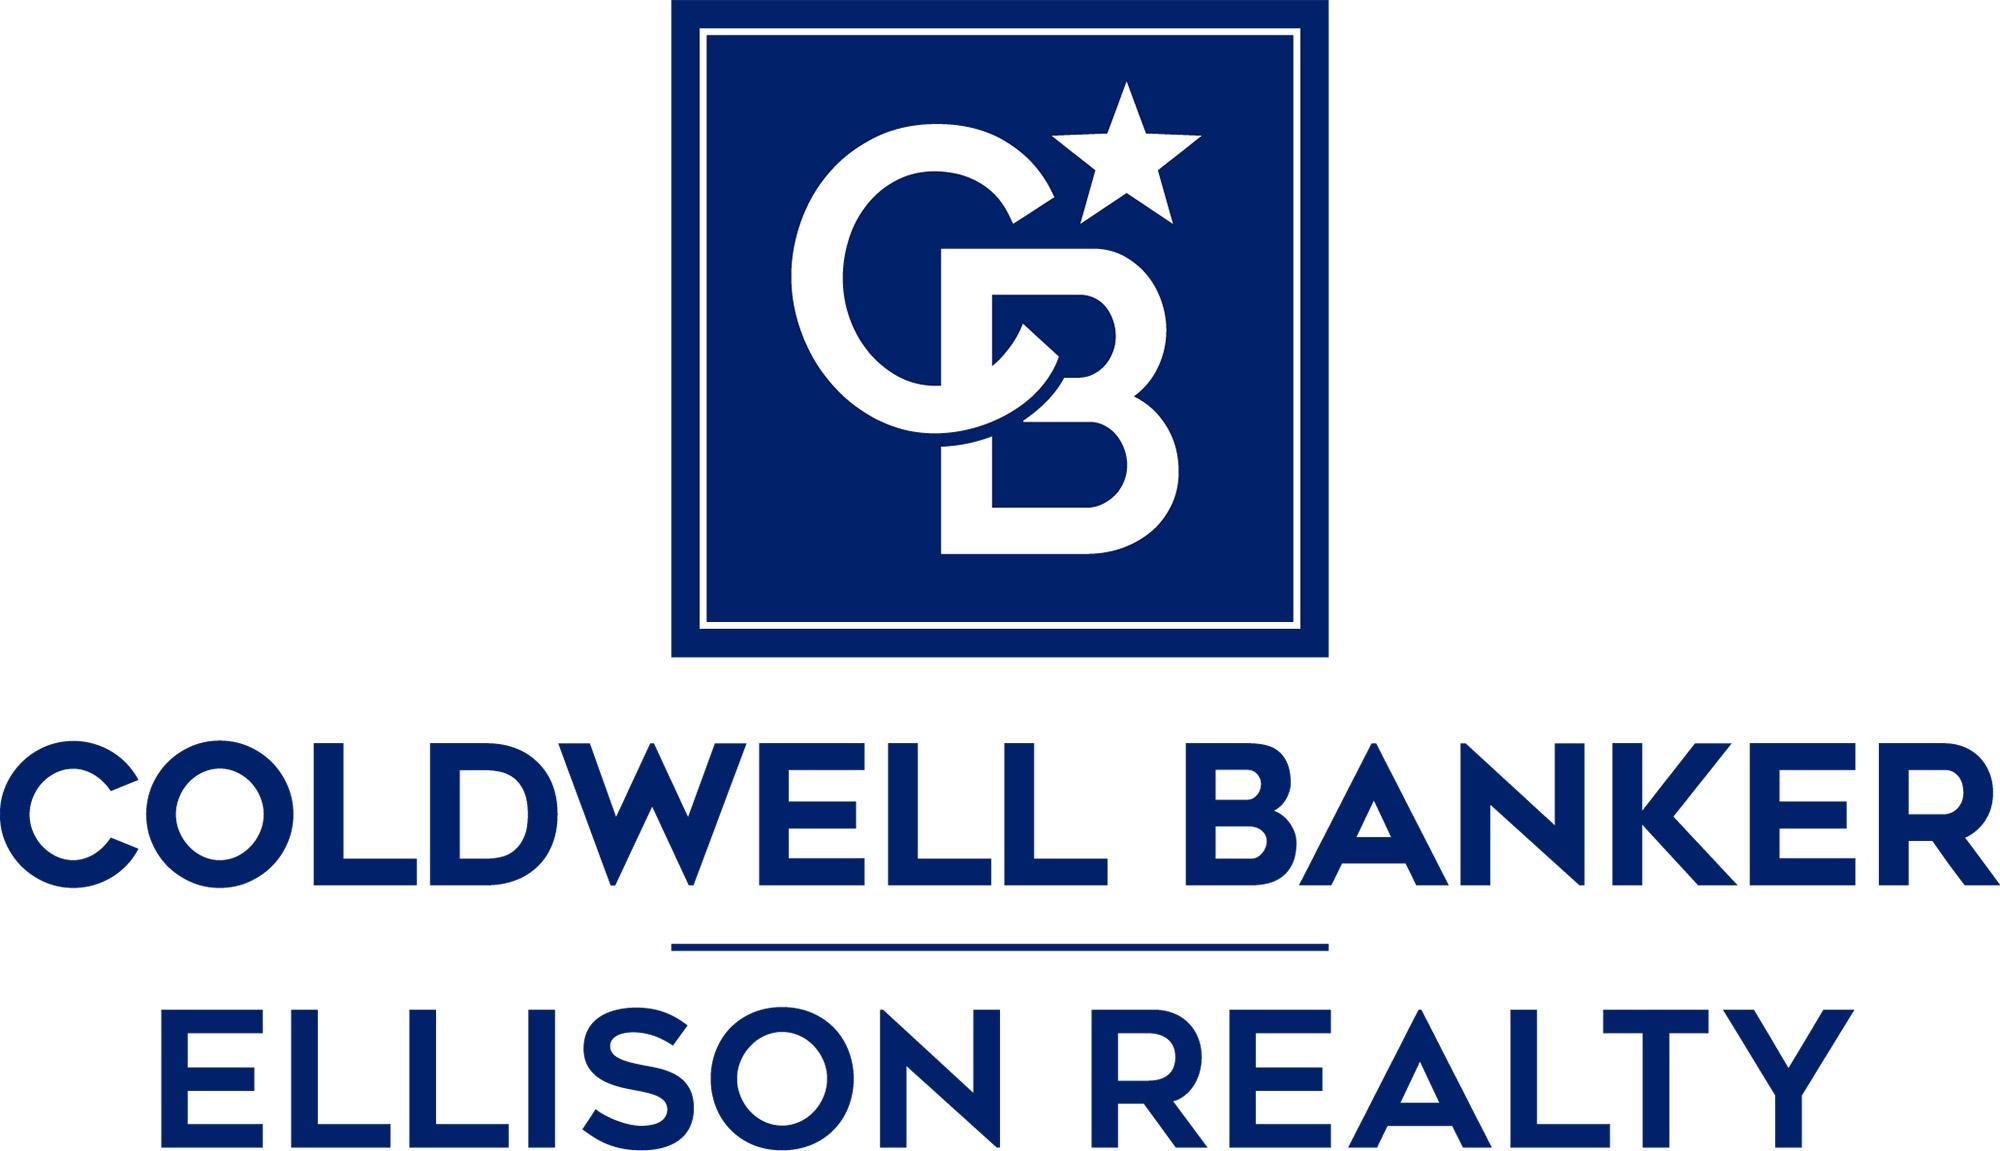 Charles Collins - Coldwell Banker Ellison Realty Logo